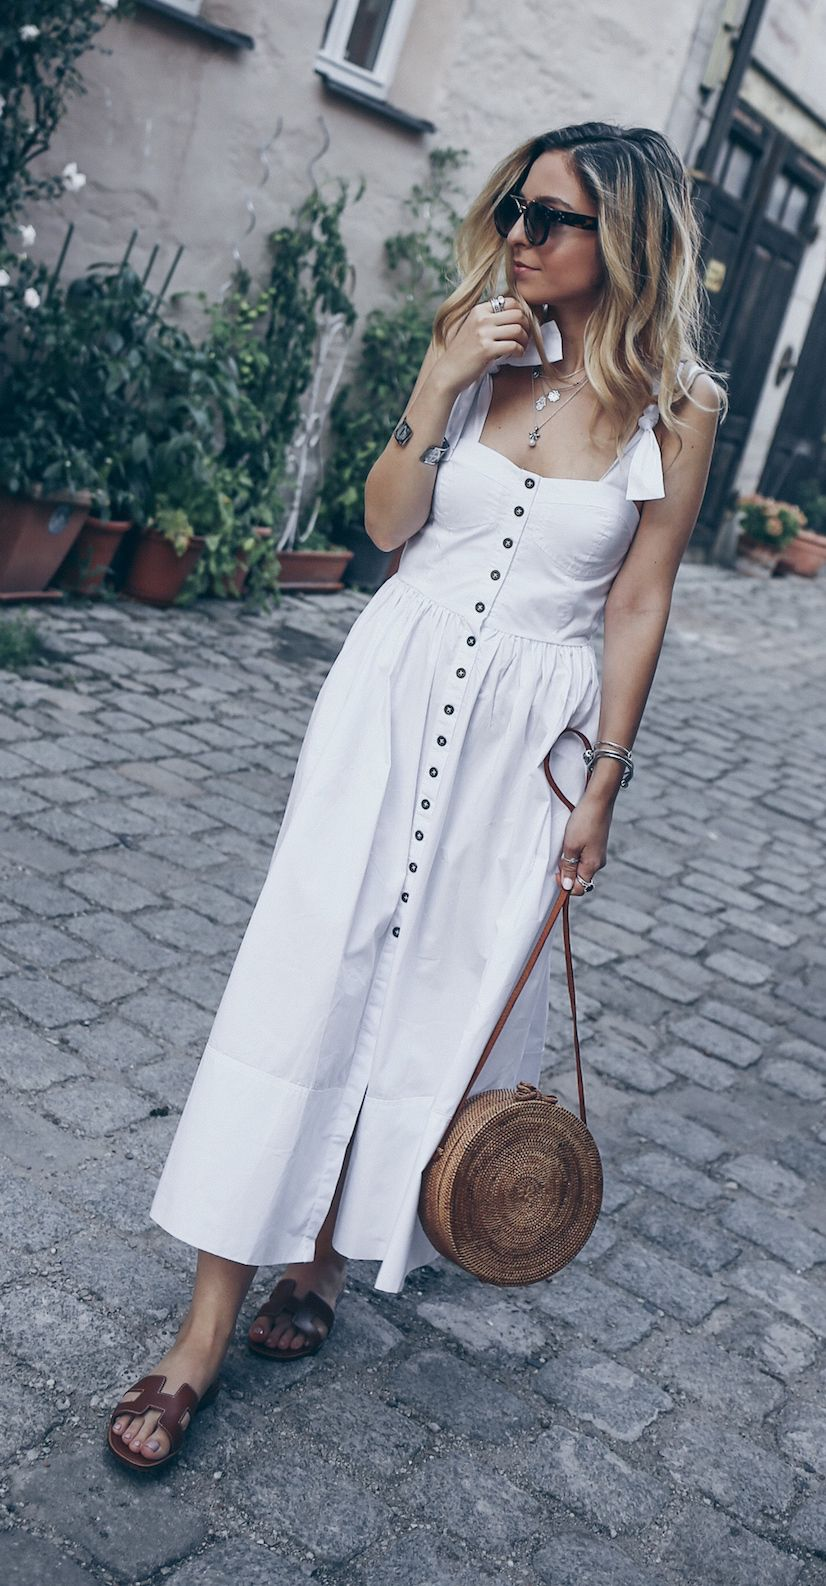 e7567f005bb4 White Dress Summer Boho Long Outfits Hermes Oran Sandals Brown